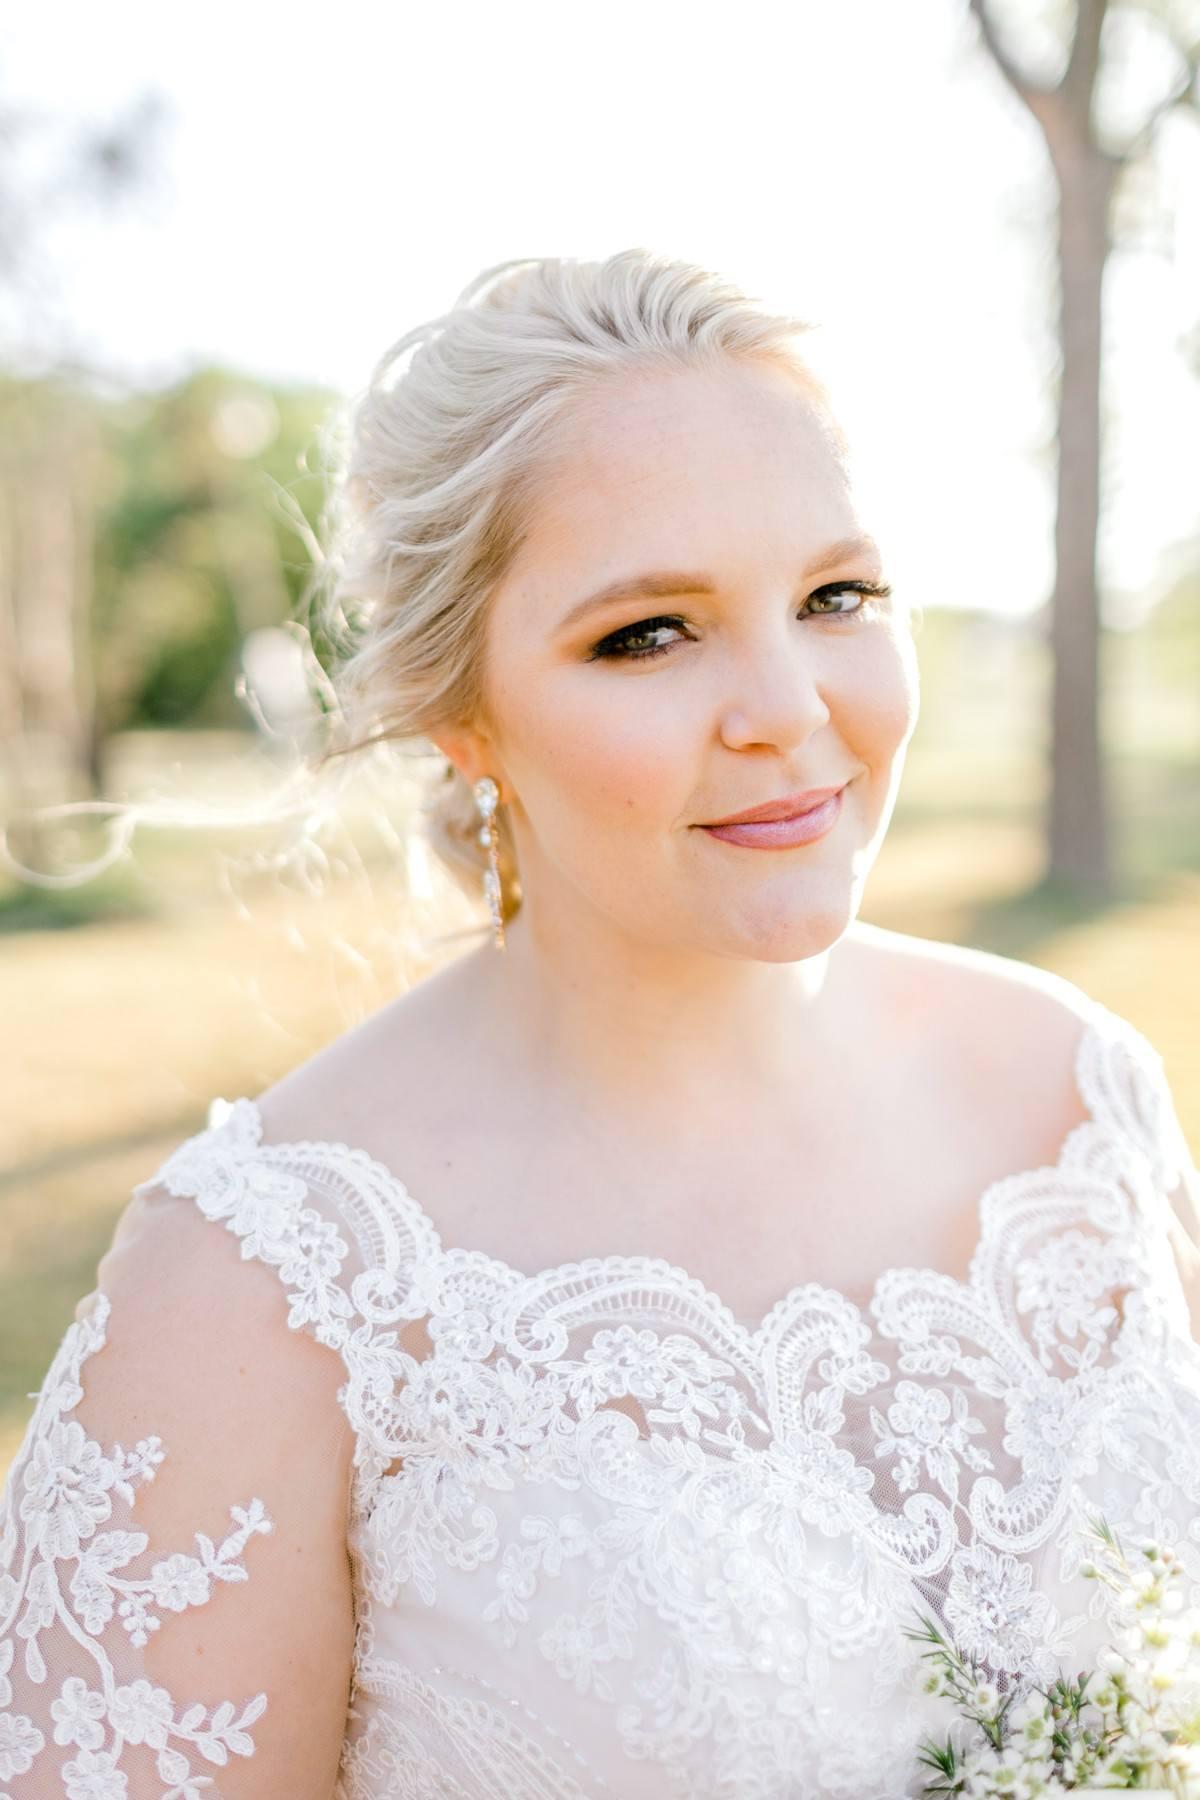 casidy-bridals-tradinghouse-lake-waco-wedding-photographer-kaitlyn-bullard-12.jpg